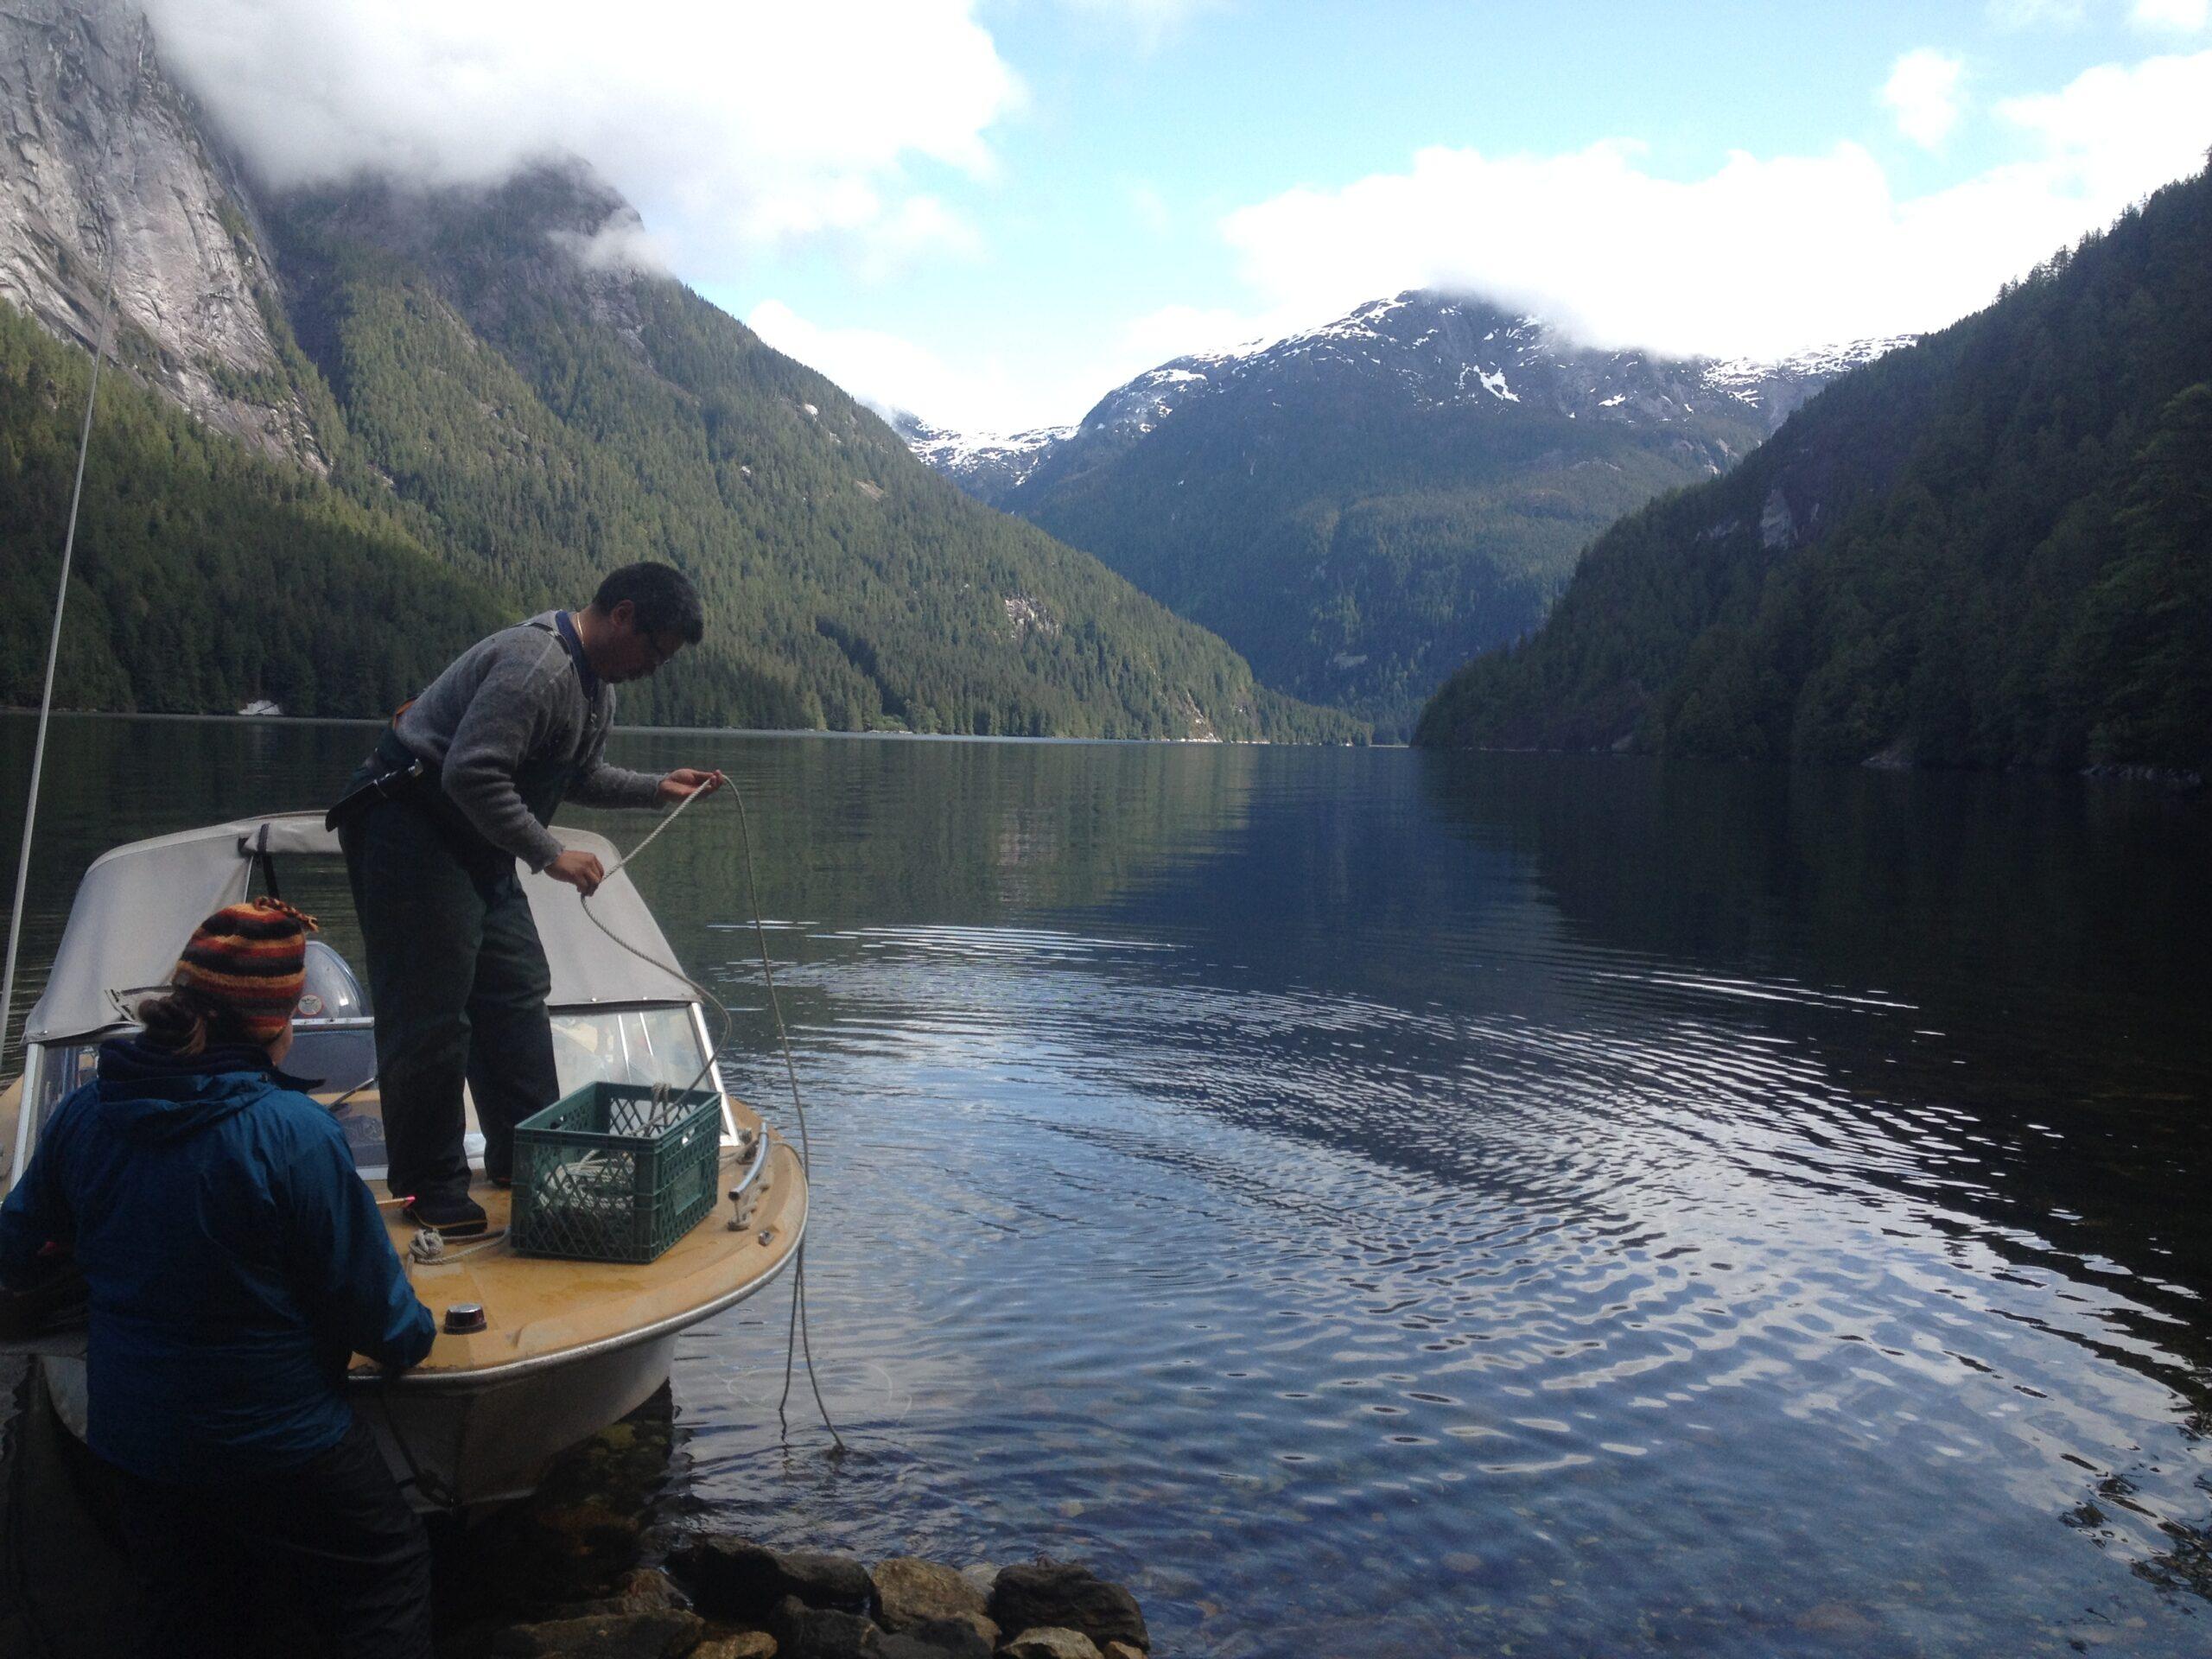 Howard preparing the anchor on Mango, one of the Raincoast boats.